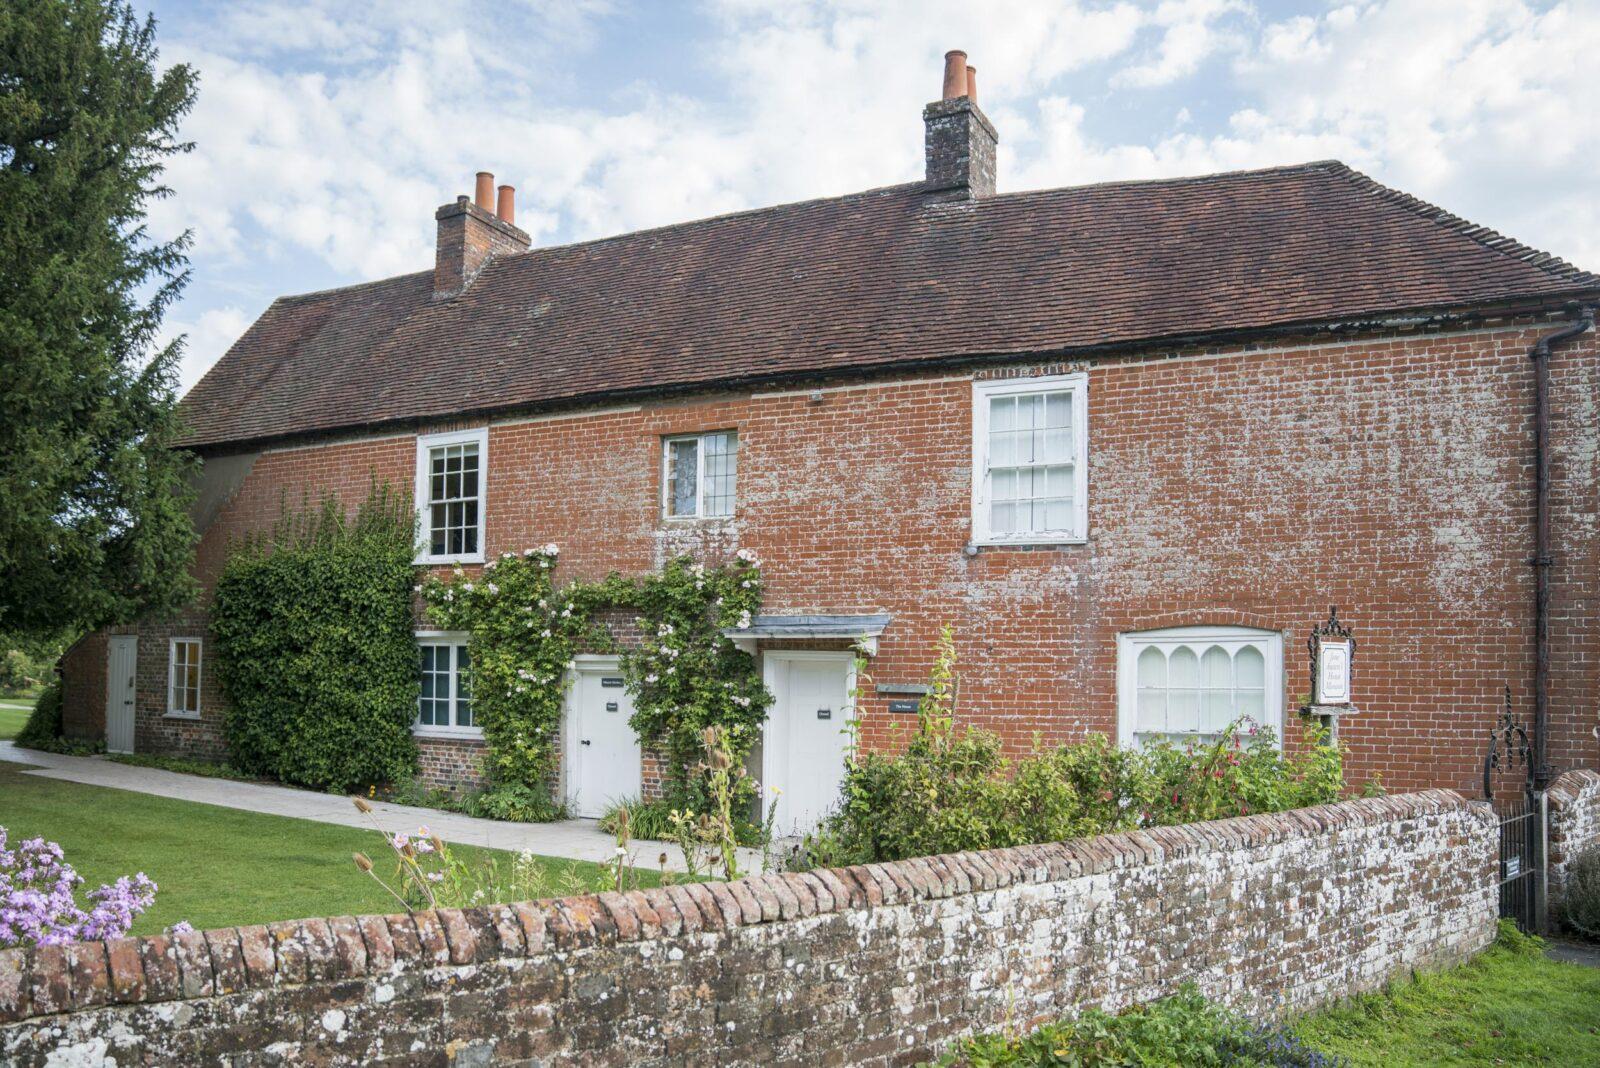 CHAWTON, UNITED KINGDOM - AUGUST 25: Jane Austen's House Museum. Rob Stothard for Jane Austen's House Museum